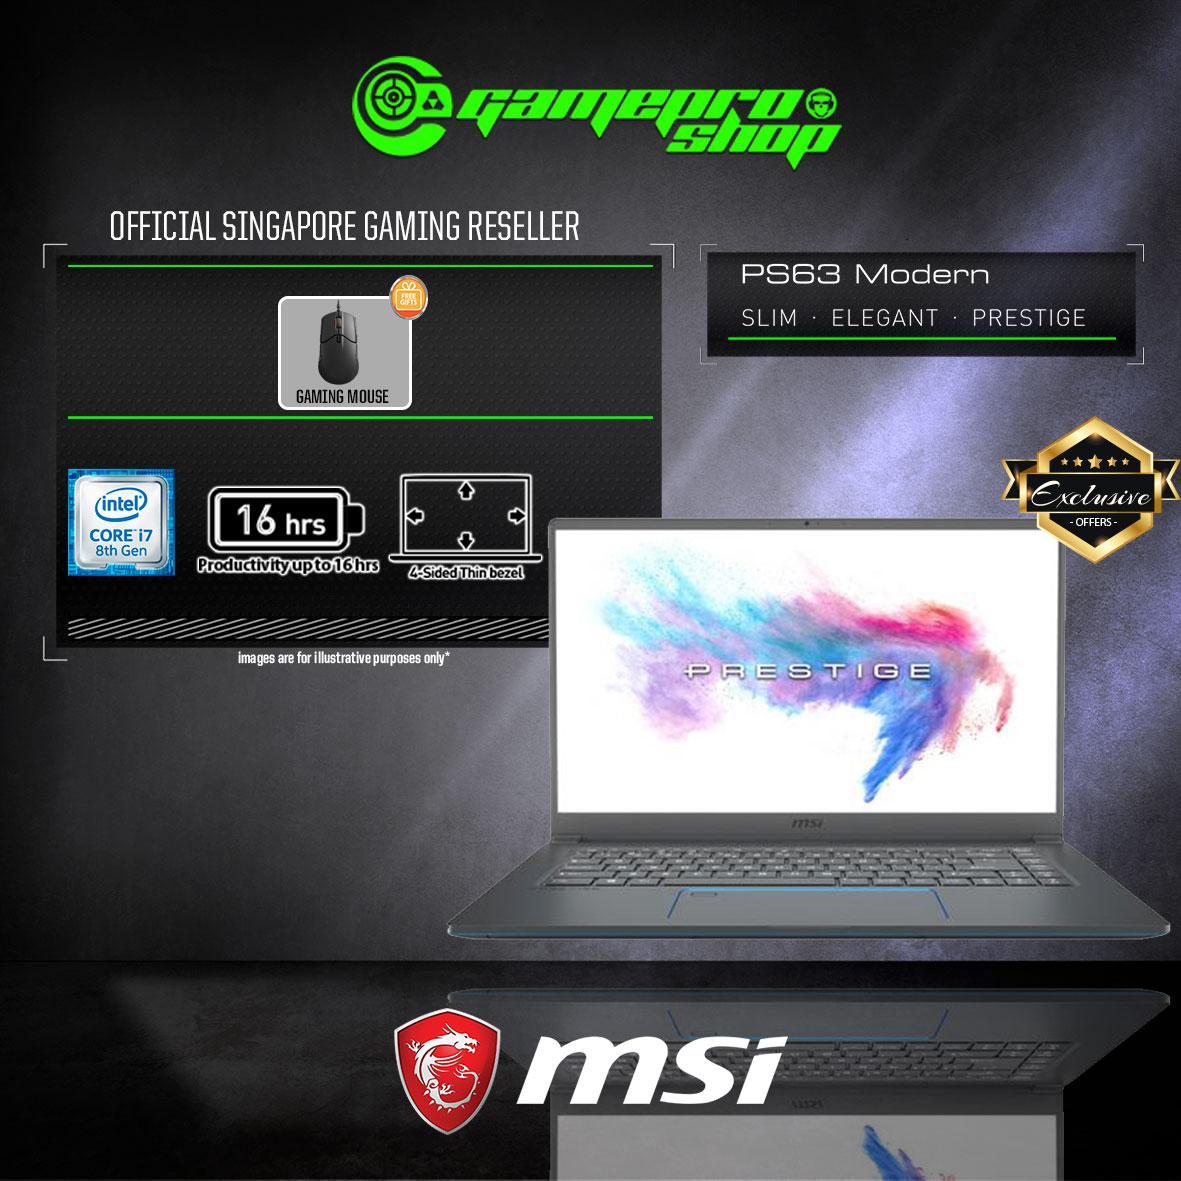 MSI PS63 GTX1650 8SC – 053SG EXCLUSIVE (i7-8565U / 16GB / 512GB SSD / WIN 10) 15.6 FHD GAMING LAPTOP *GSS PROMO*